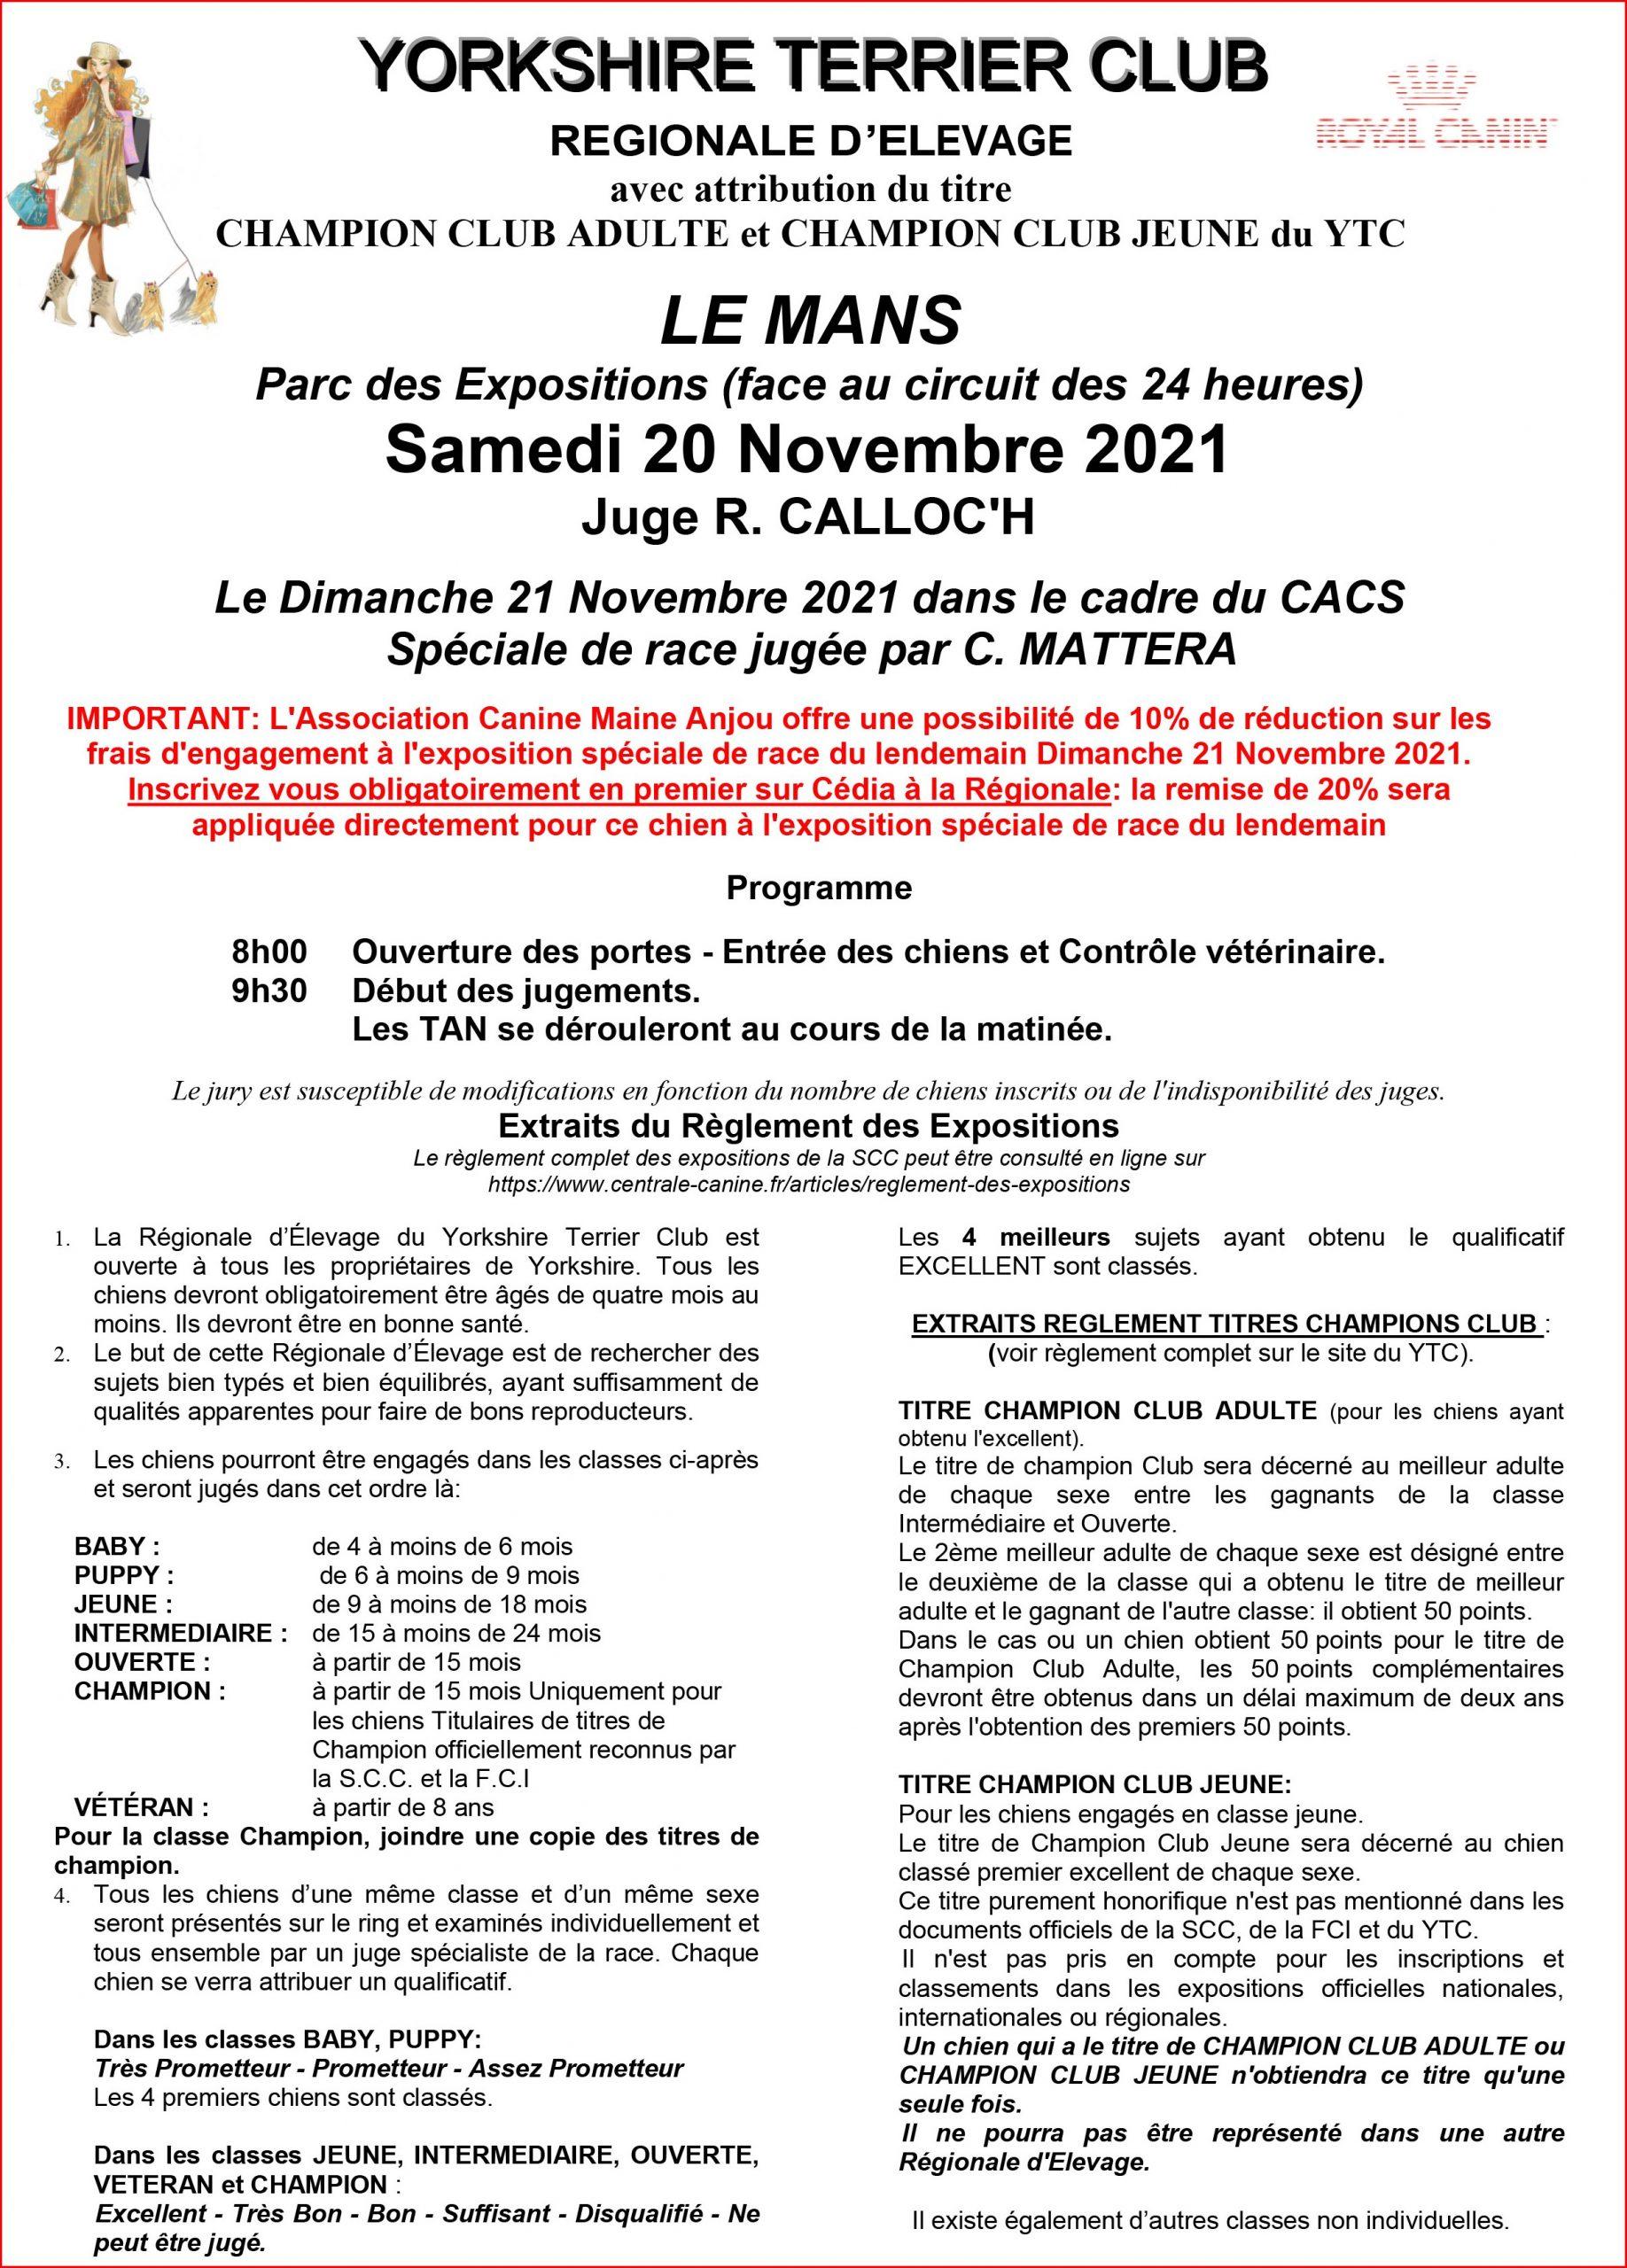 Microsoft Word - Feuille RE LE MANS 2021.docx